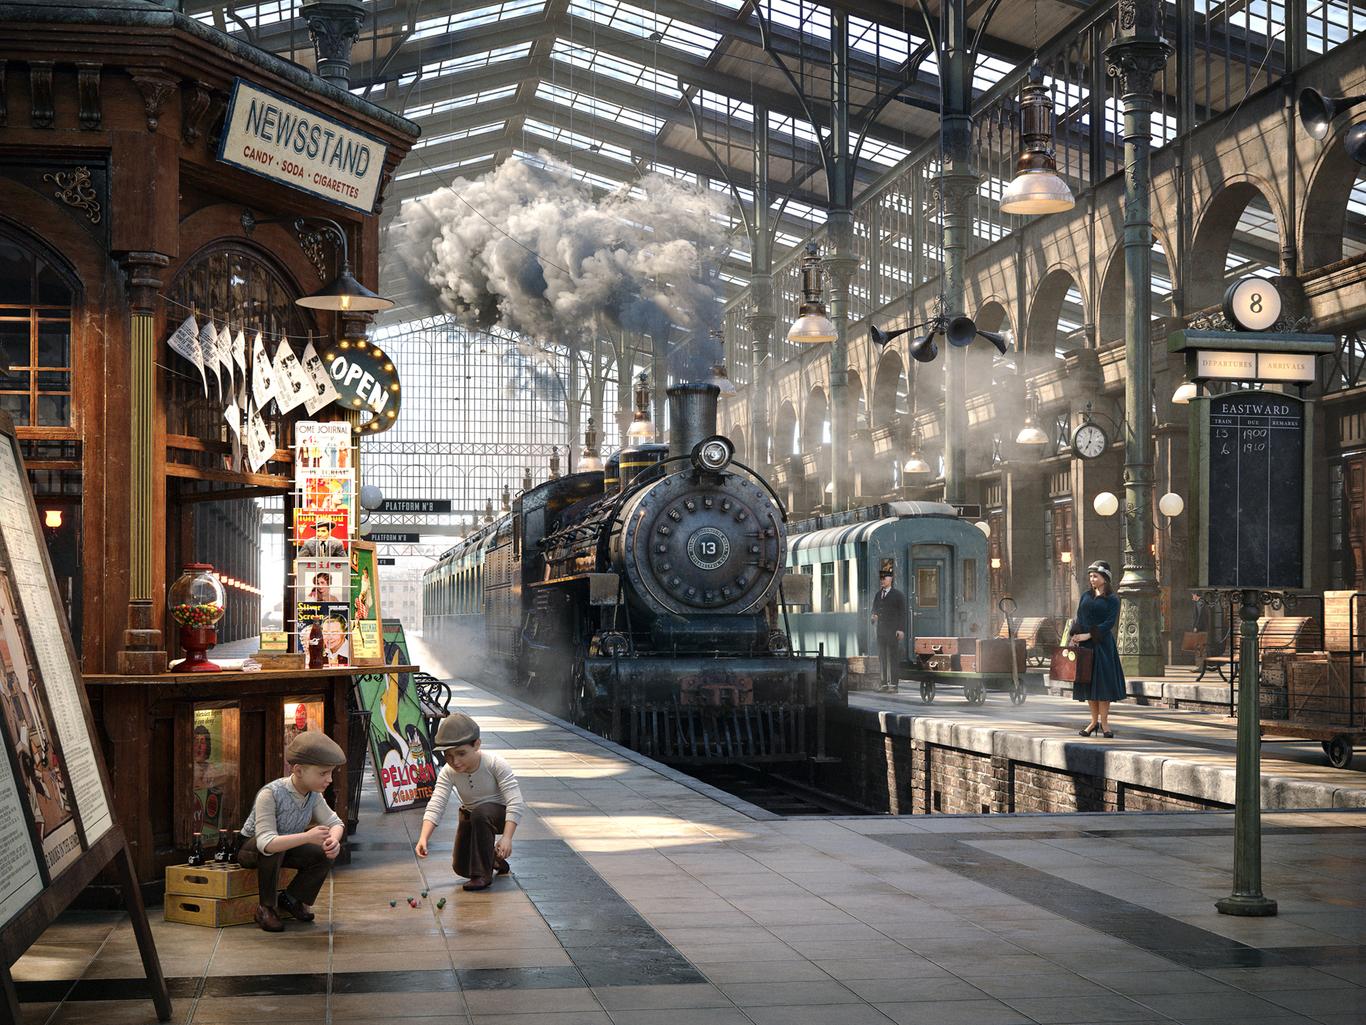 Latter 1930s trainstation 1 7c695b0a b8ub